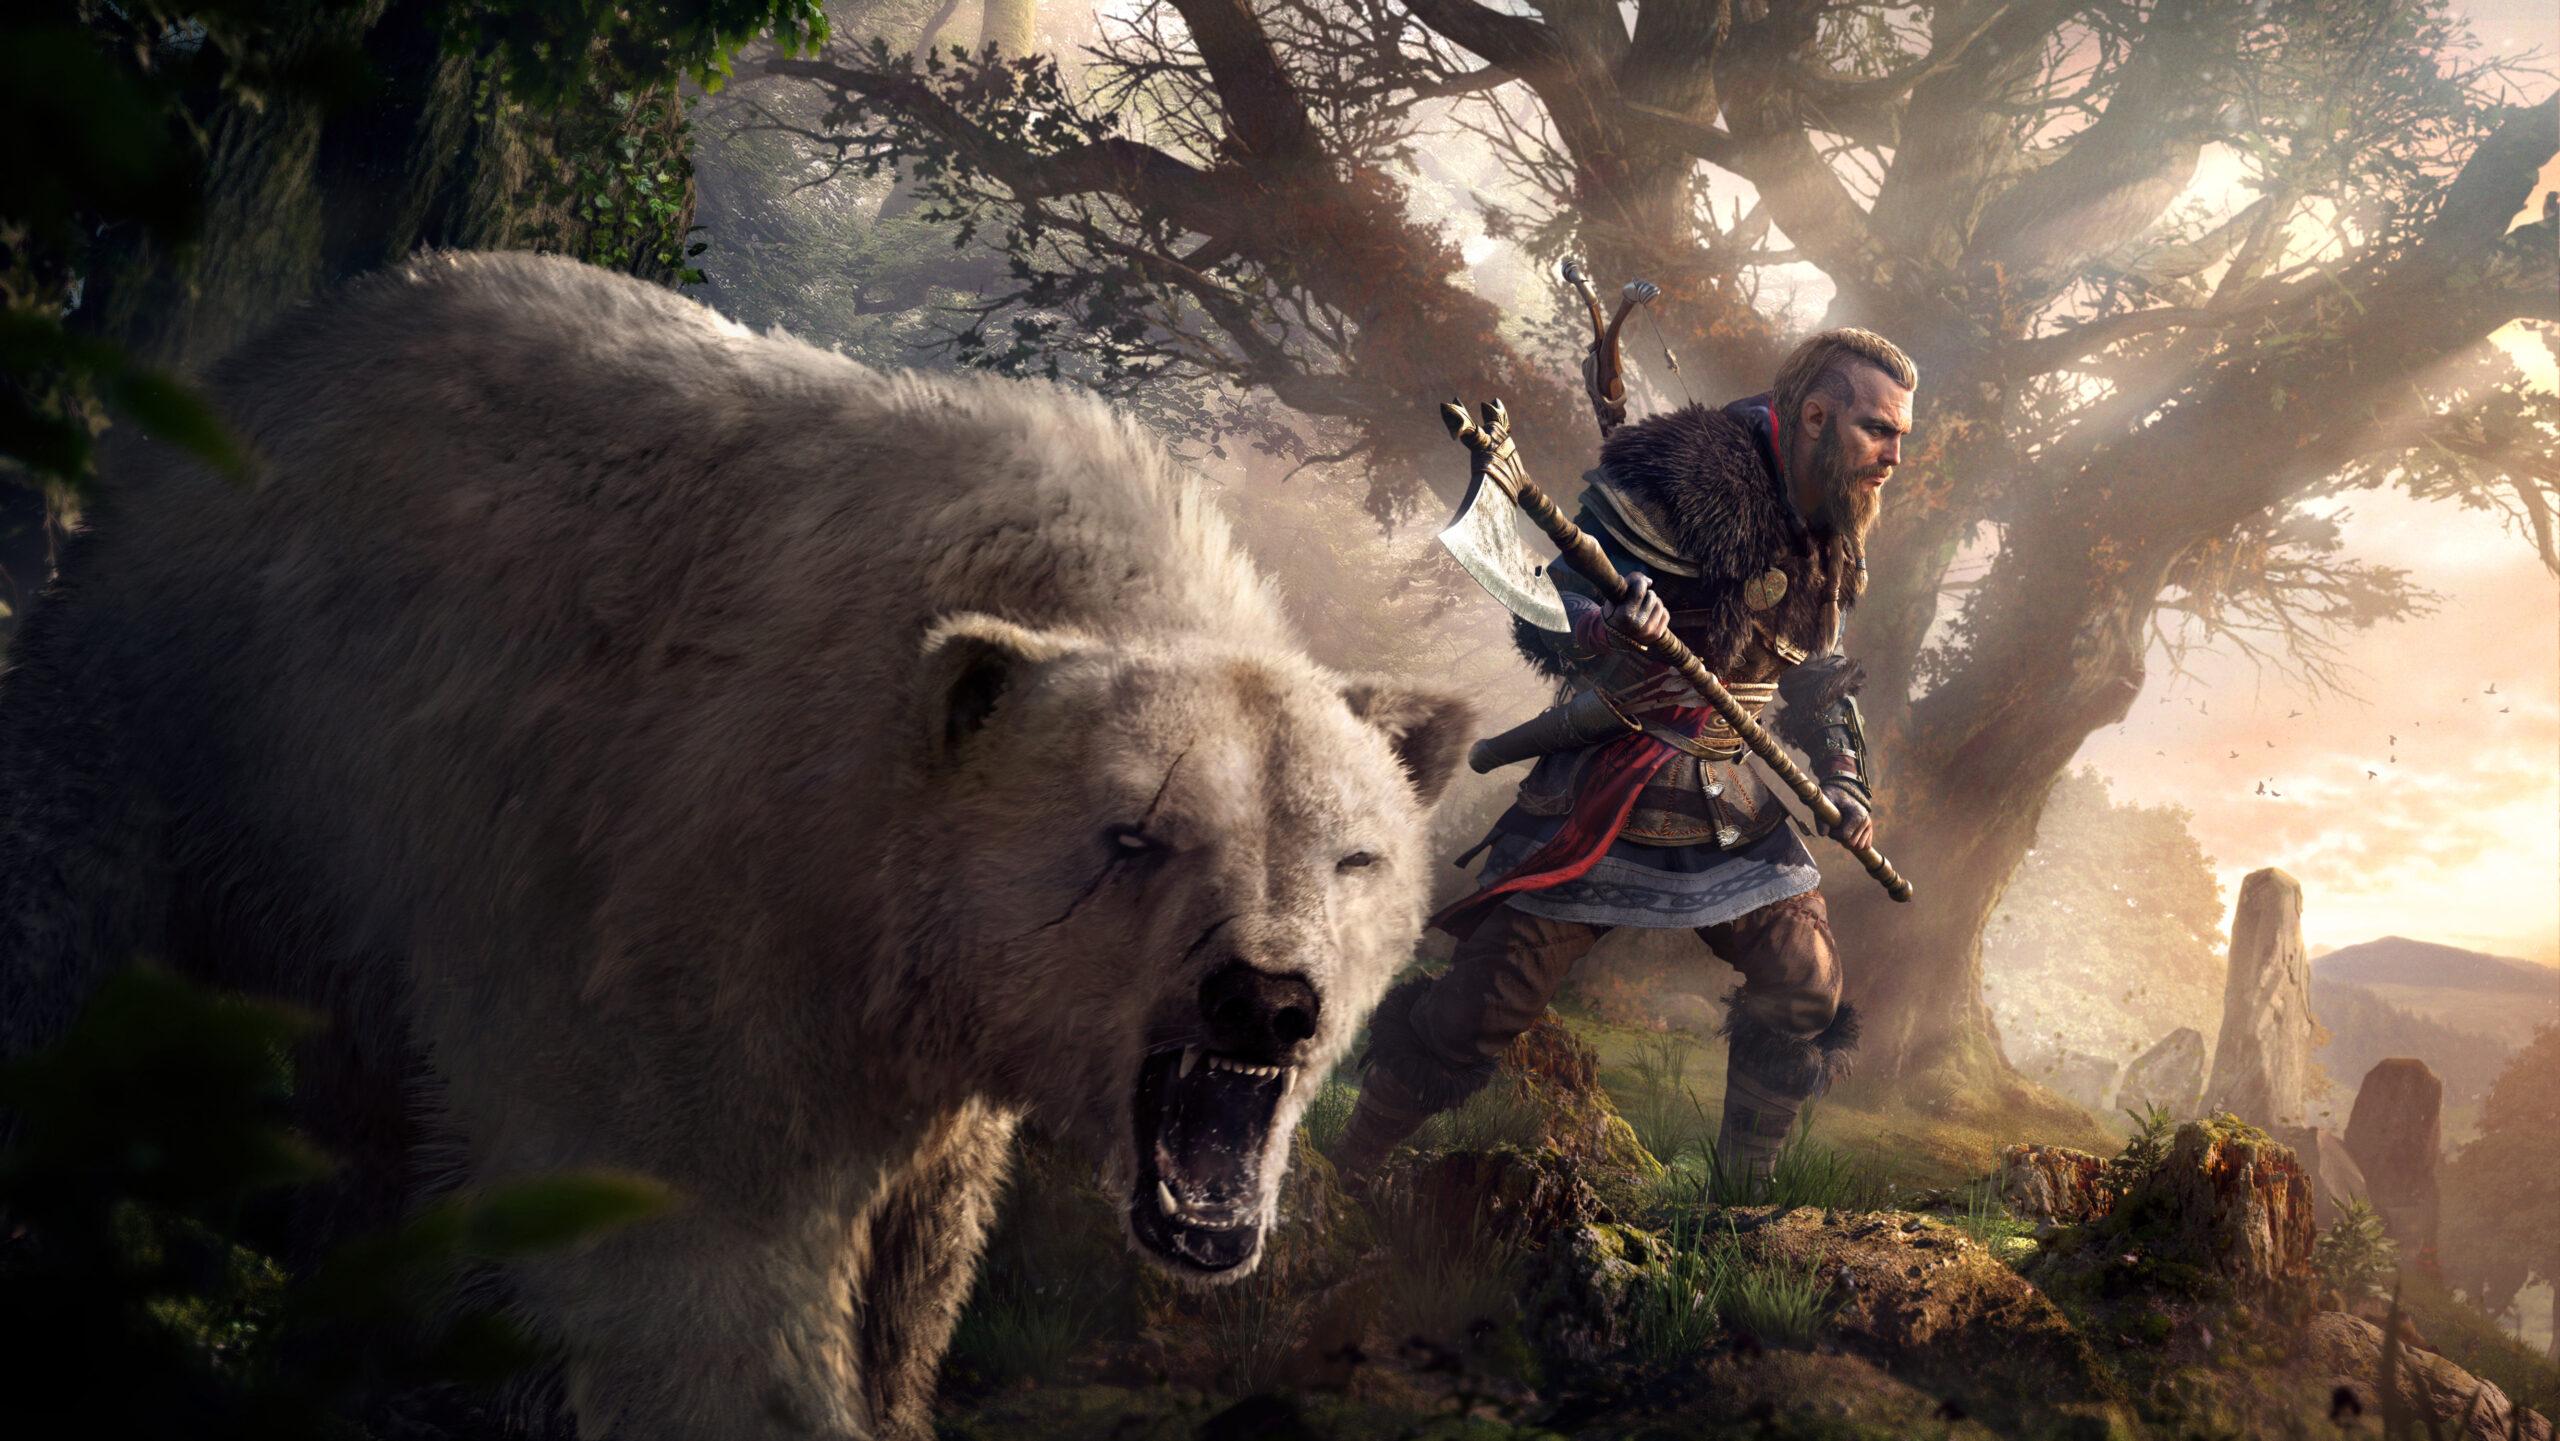 Assassins Creed evolución hasta ahora